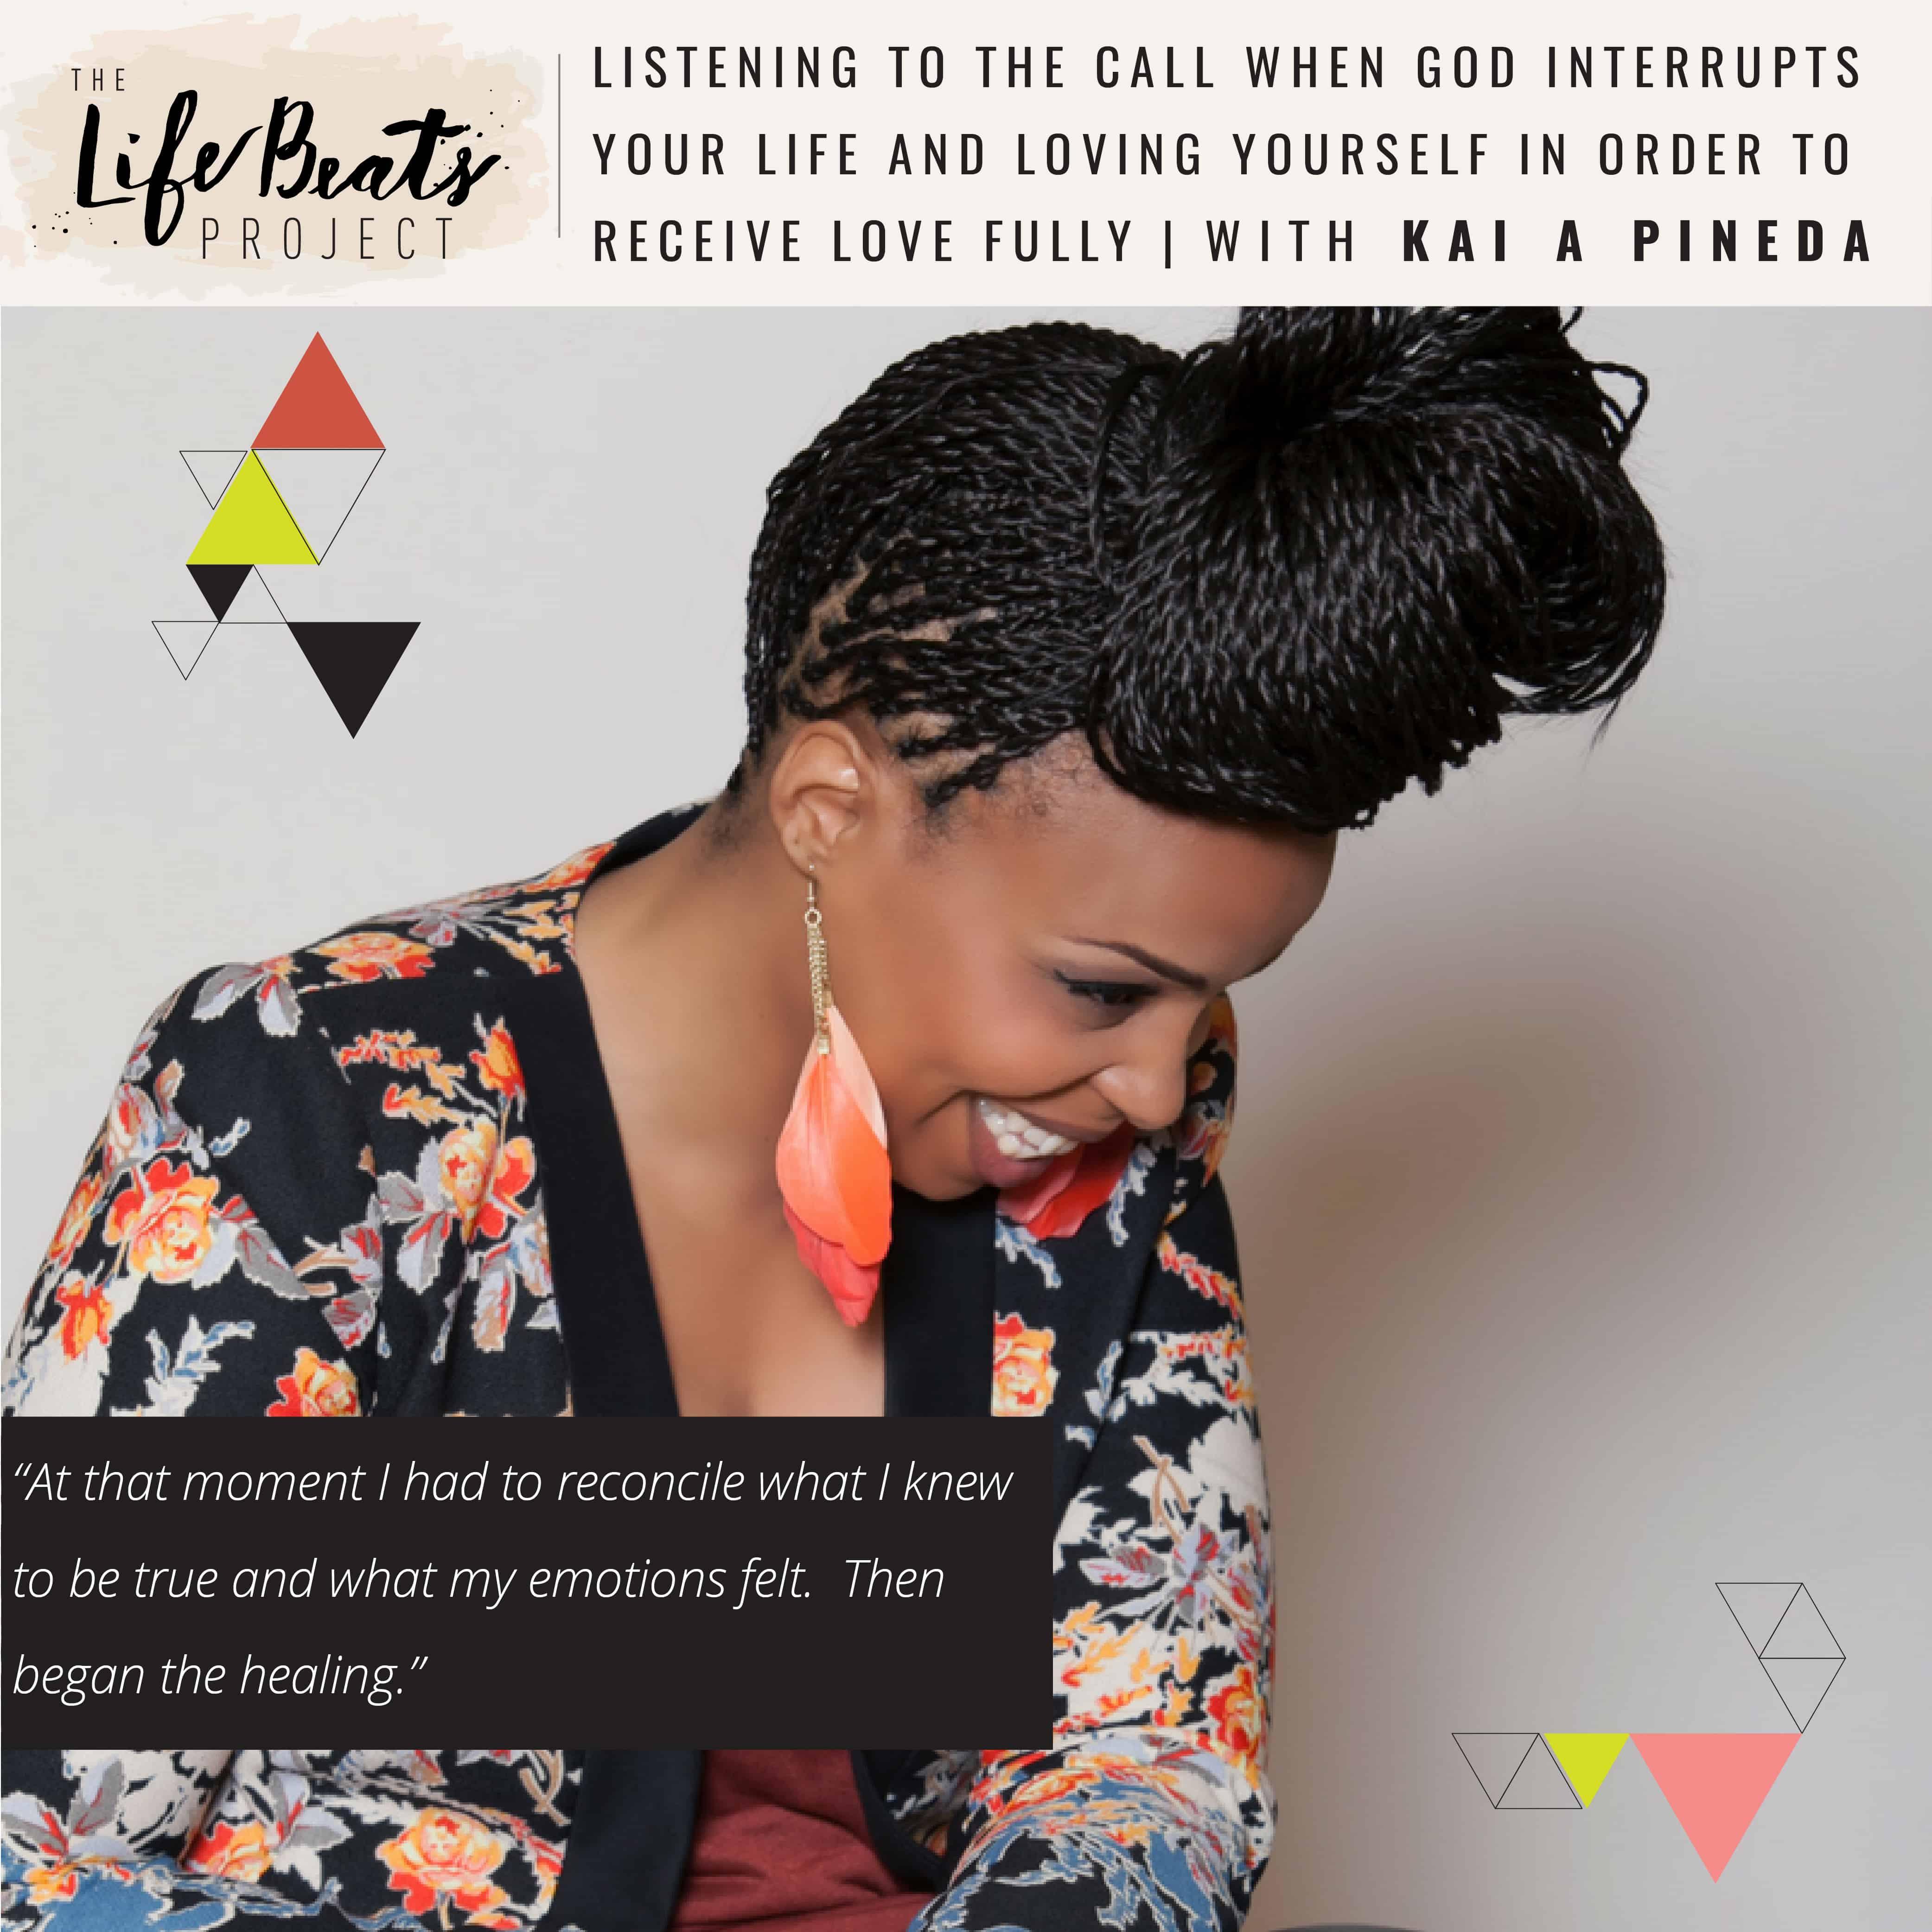 Kai A Pineda Unshakeable pastor singer Jesus girl podcast bridging racial divide